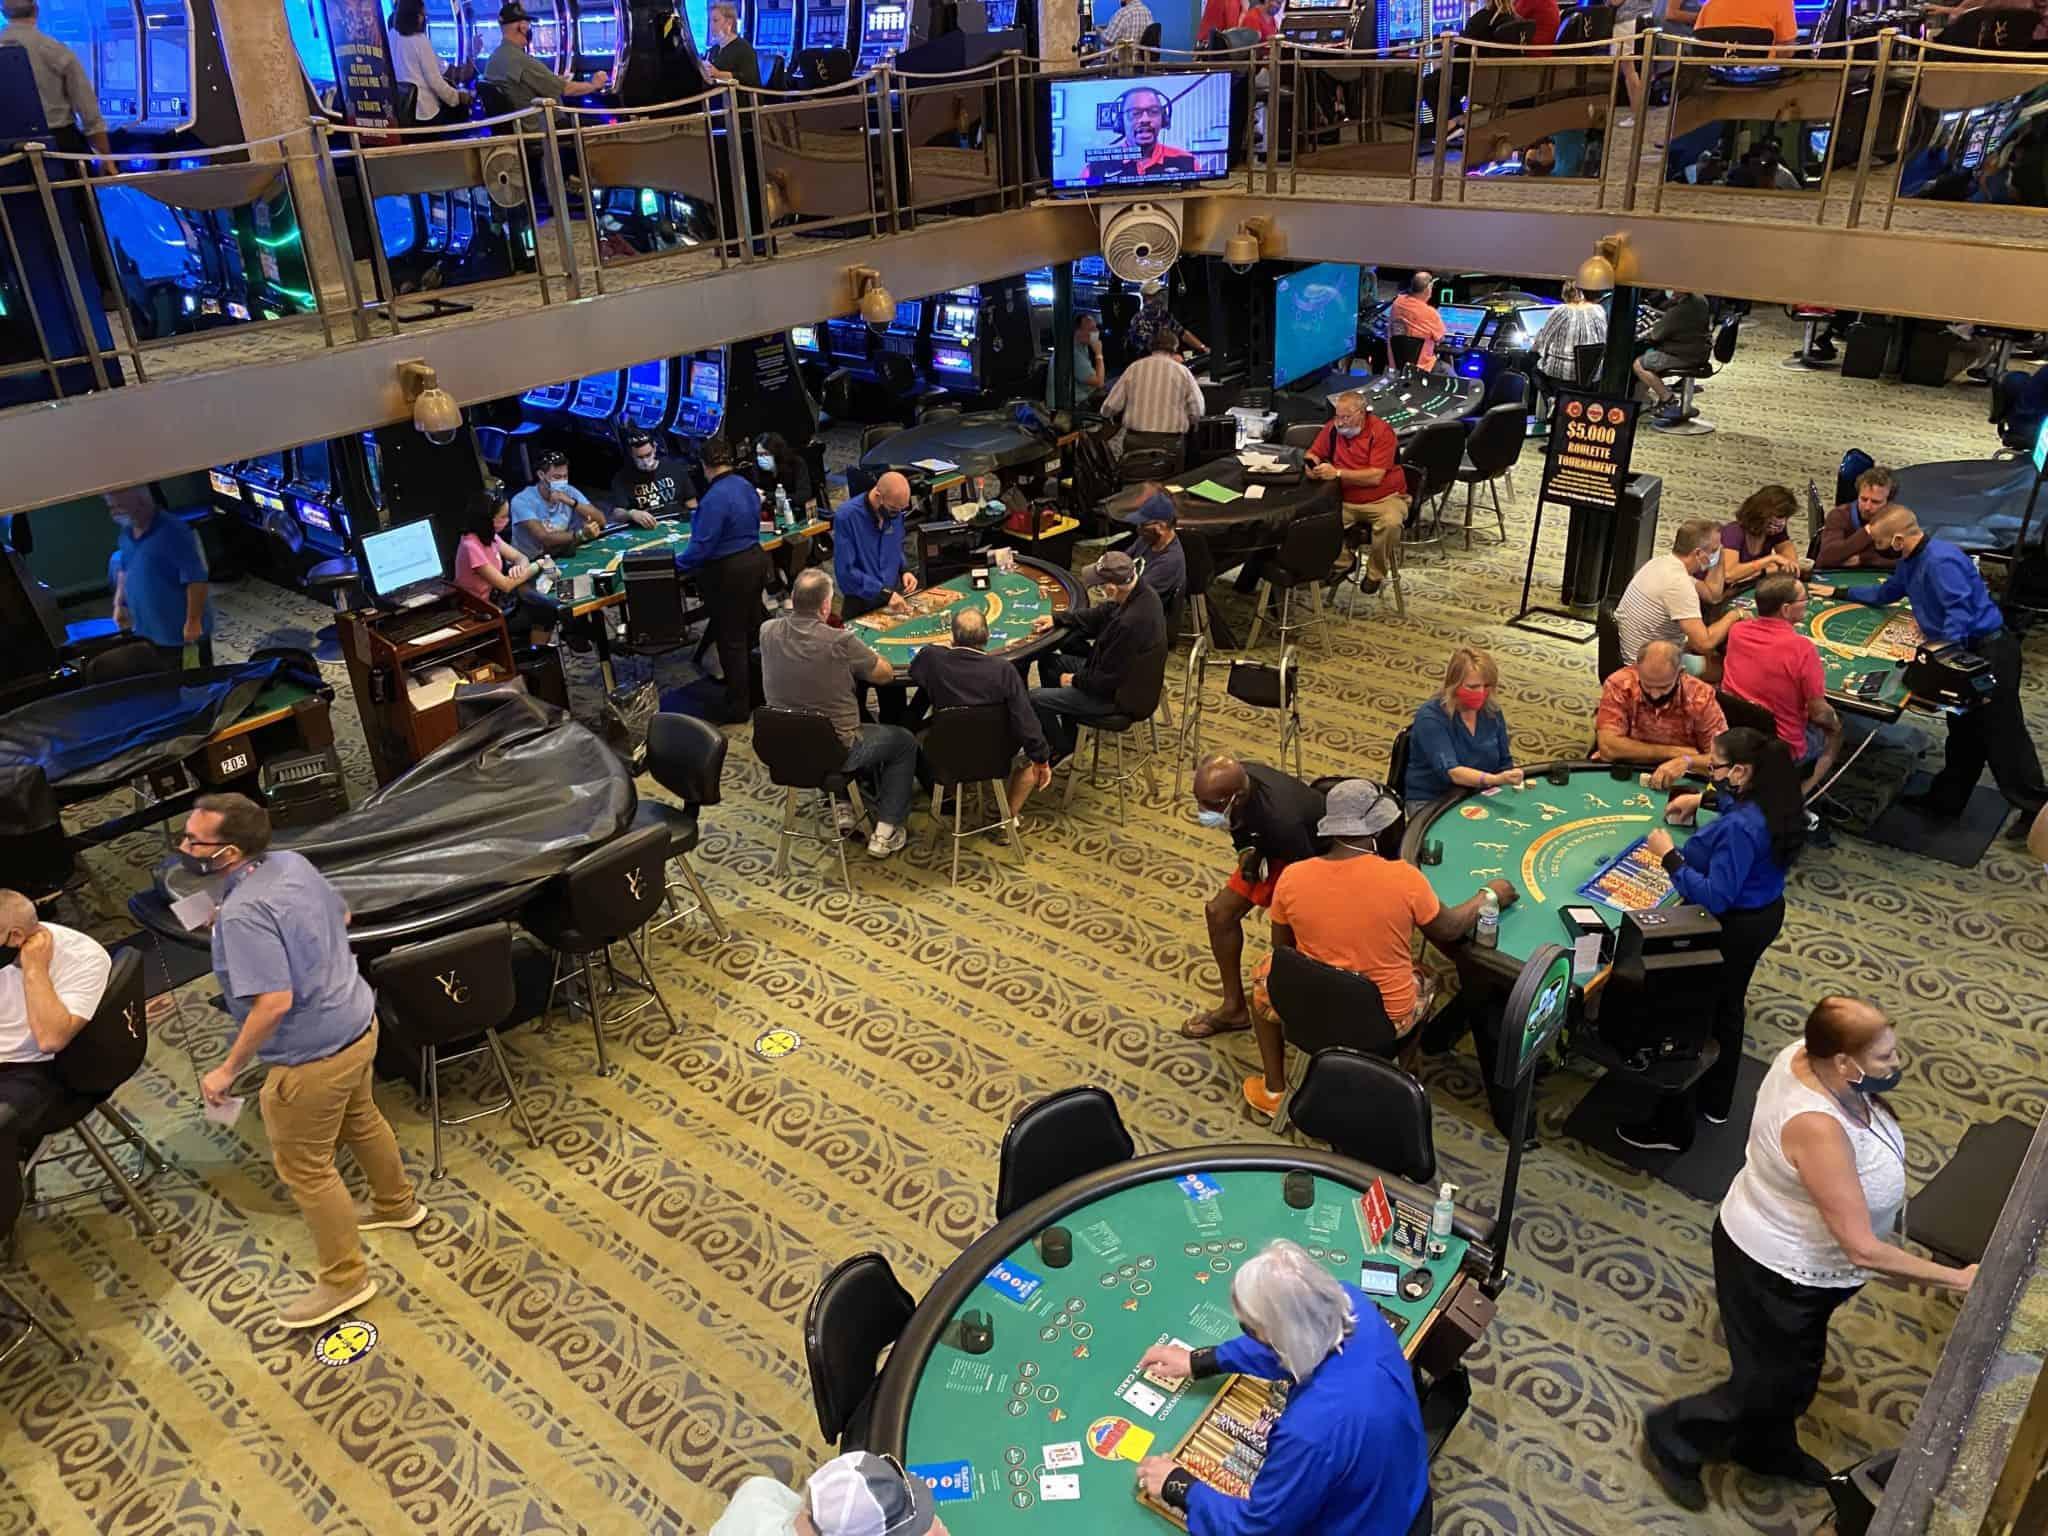 victory cruise casino floor